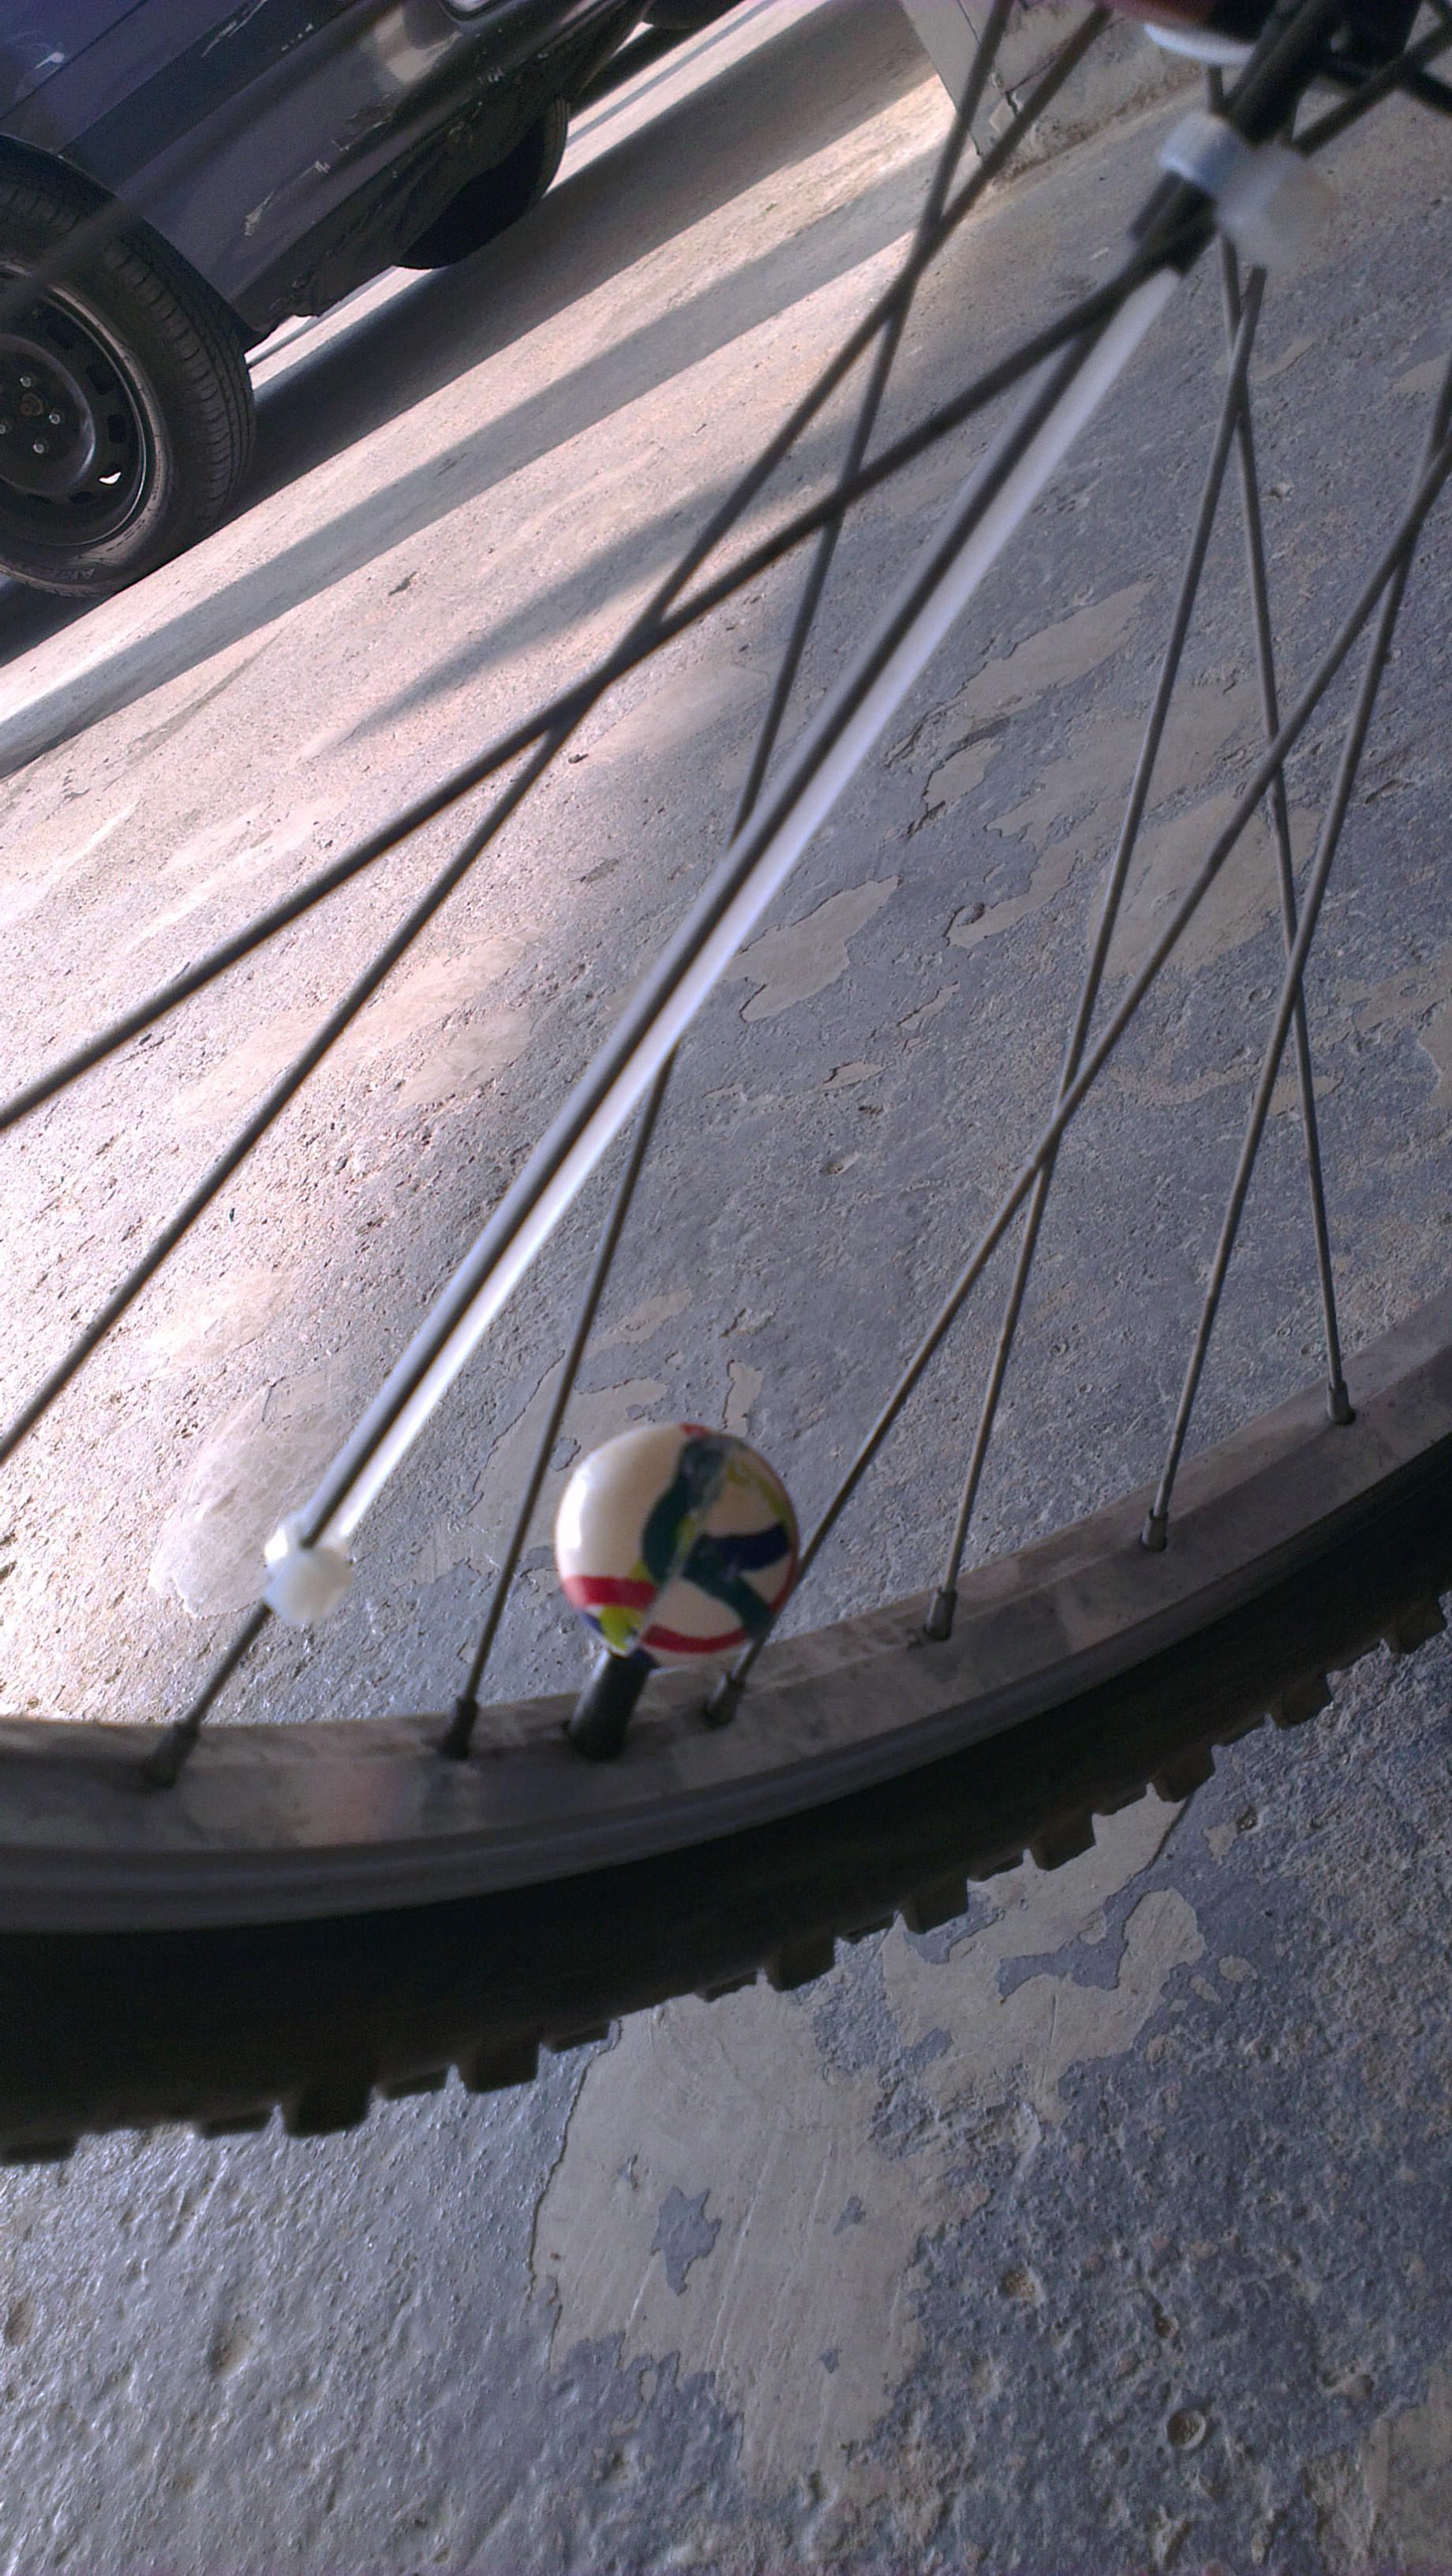 Picture of Custom Air Valve ( Bike, Car, Anything ! ) DIY